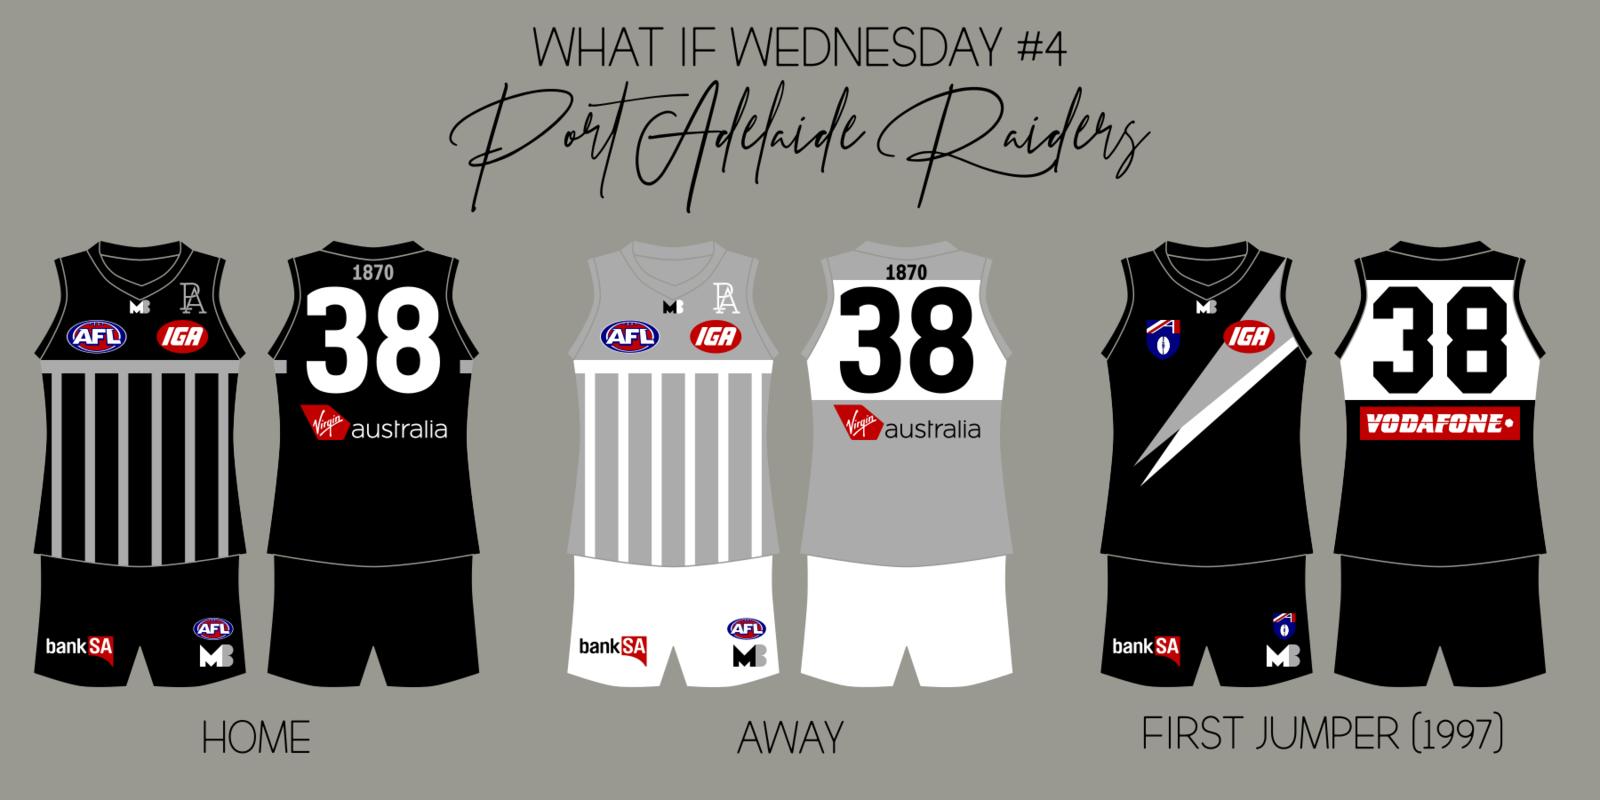 04 Port Adelaide Raiders.png